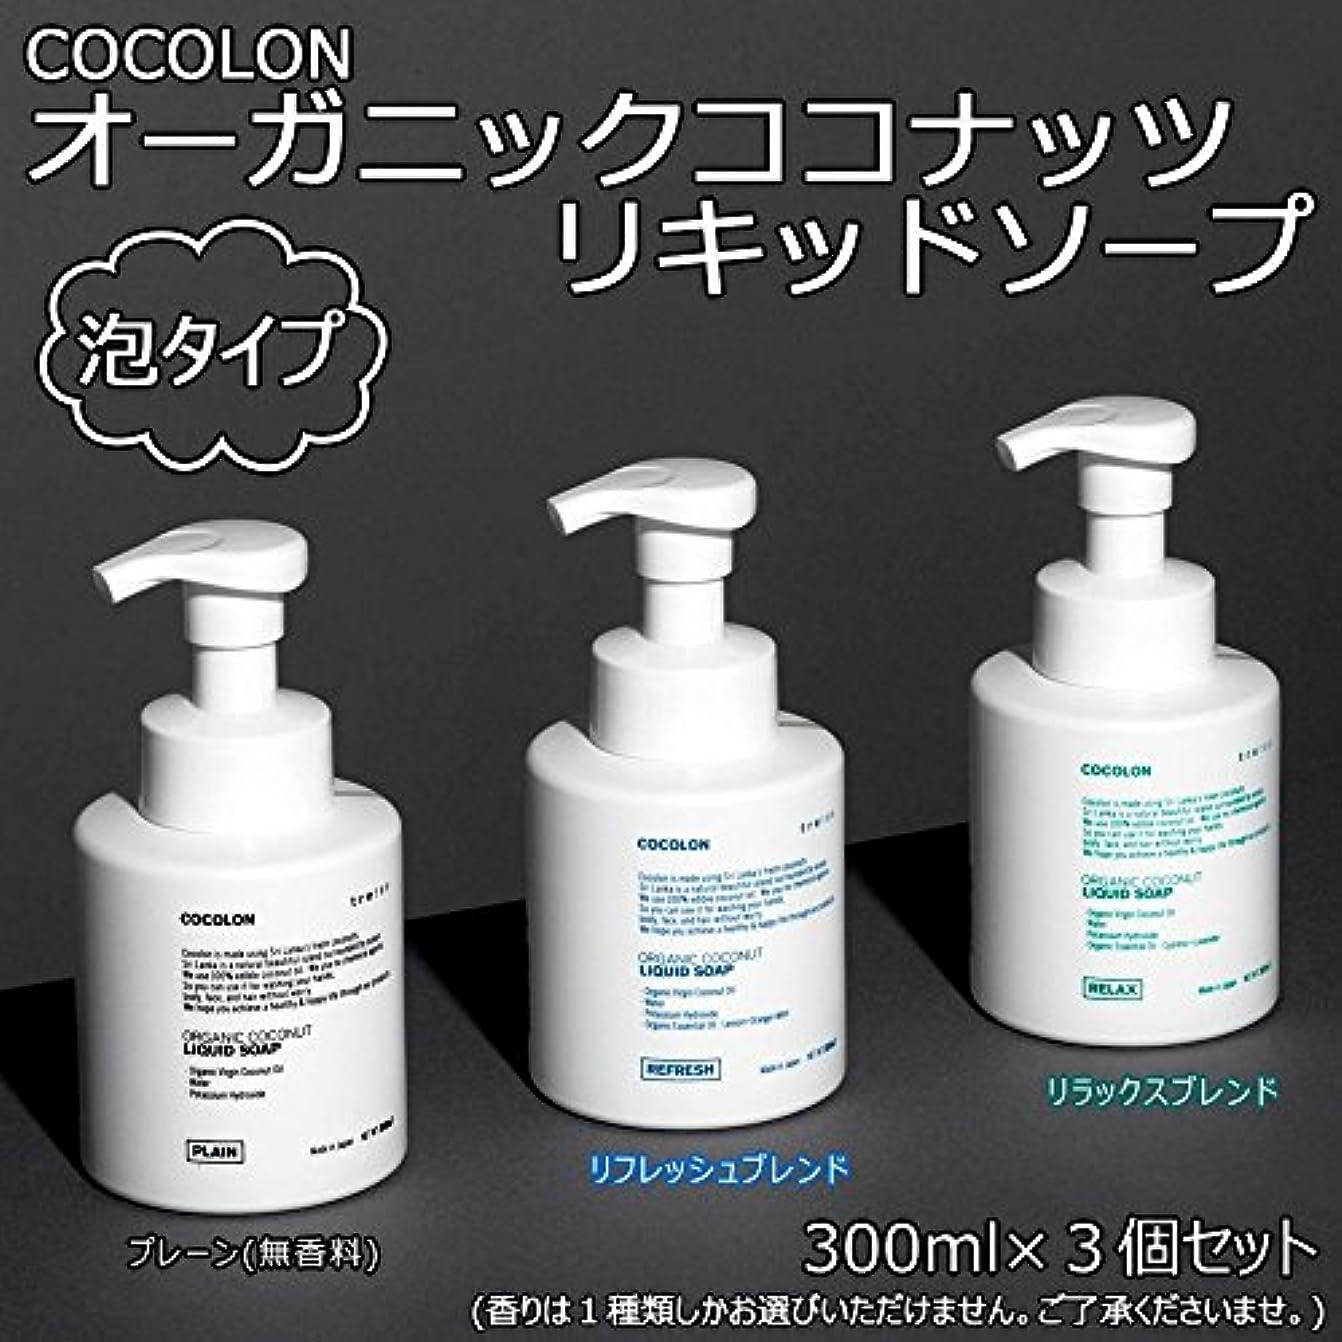 COCOLON ココロン オーガニックココナッツリキッドソープ 泡タイプ 300ml 3個セット【同梱?代引不可】 ■3種類の内「リフレッシュブレンド」のみです